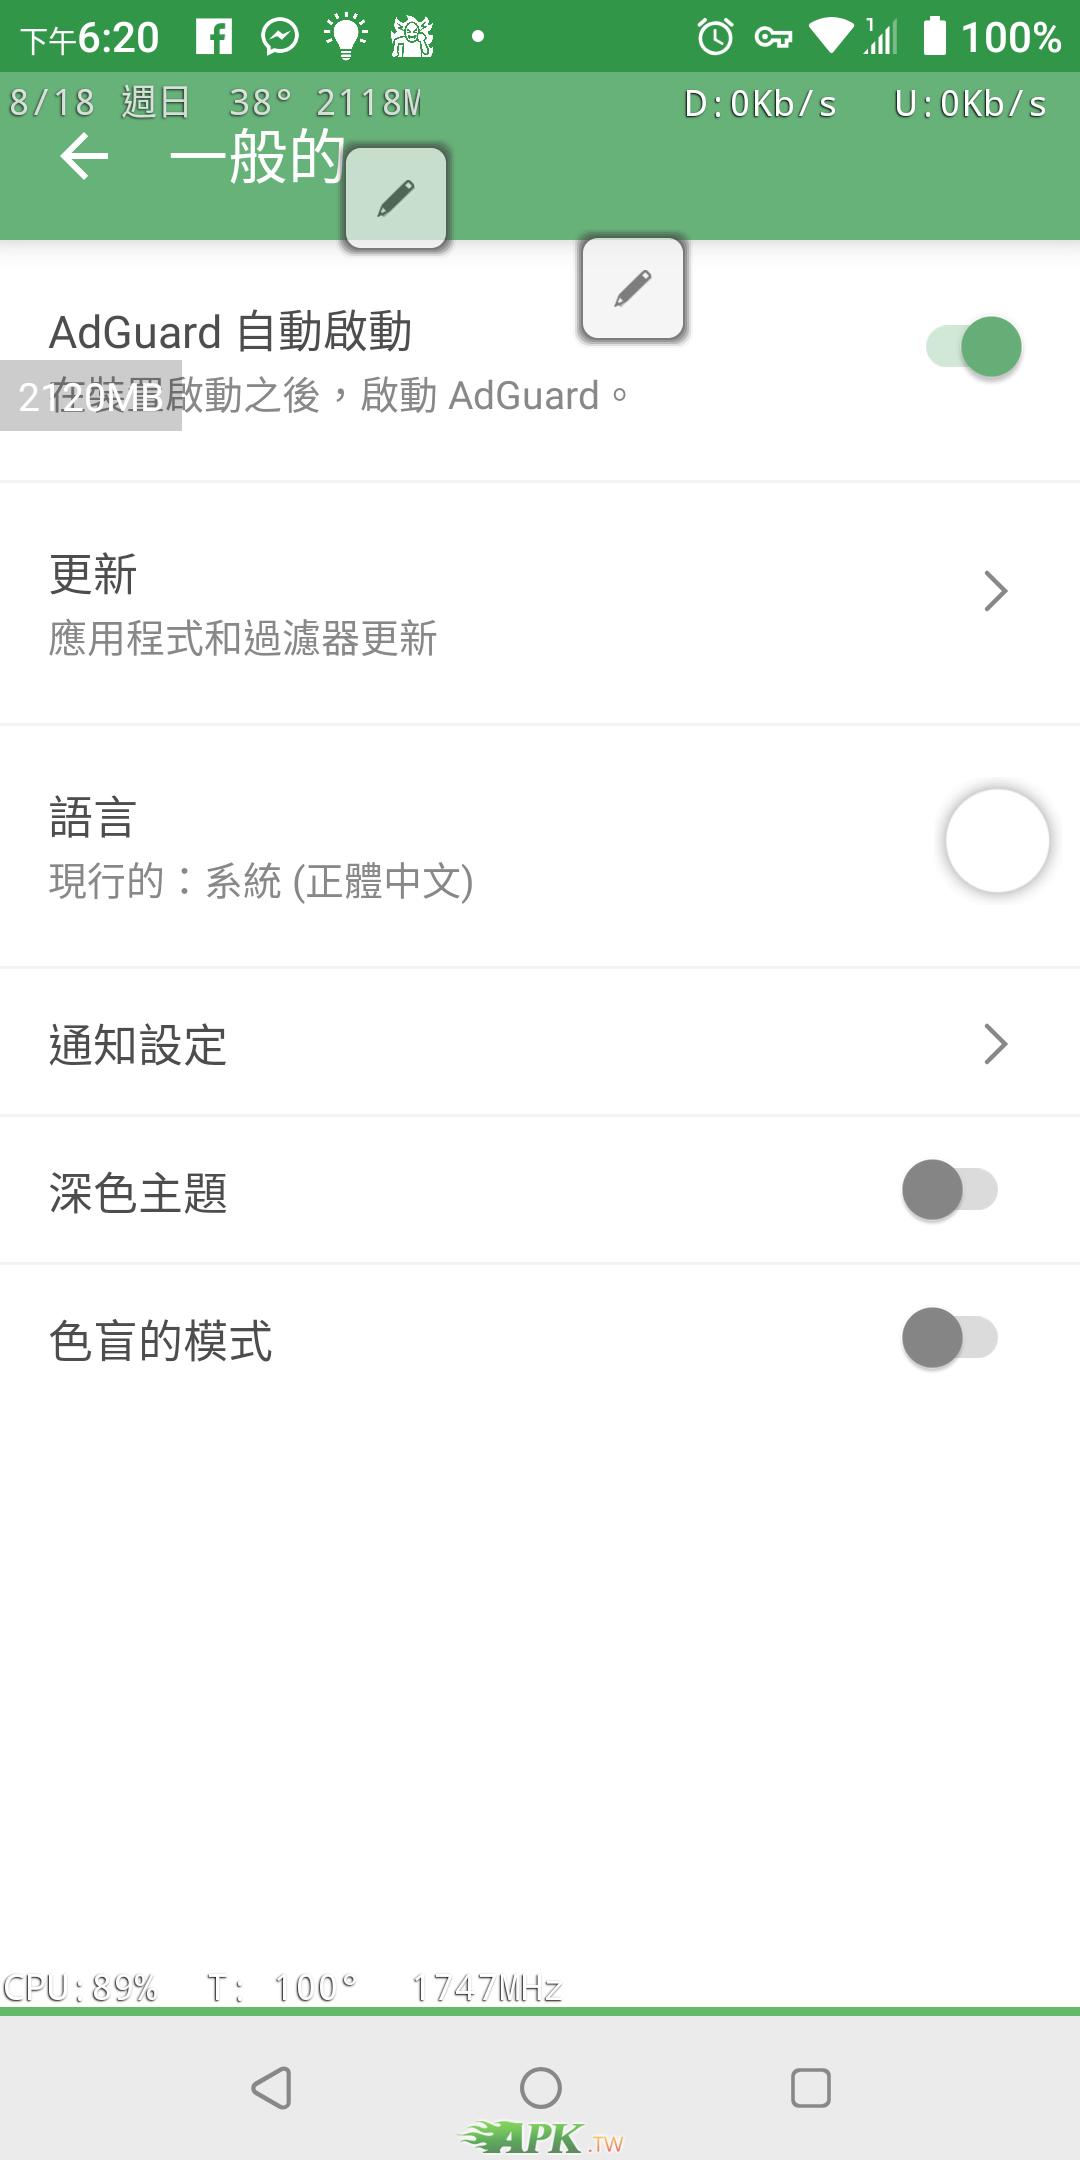 Screenshot_20190818-182058.png